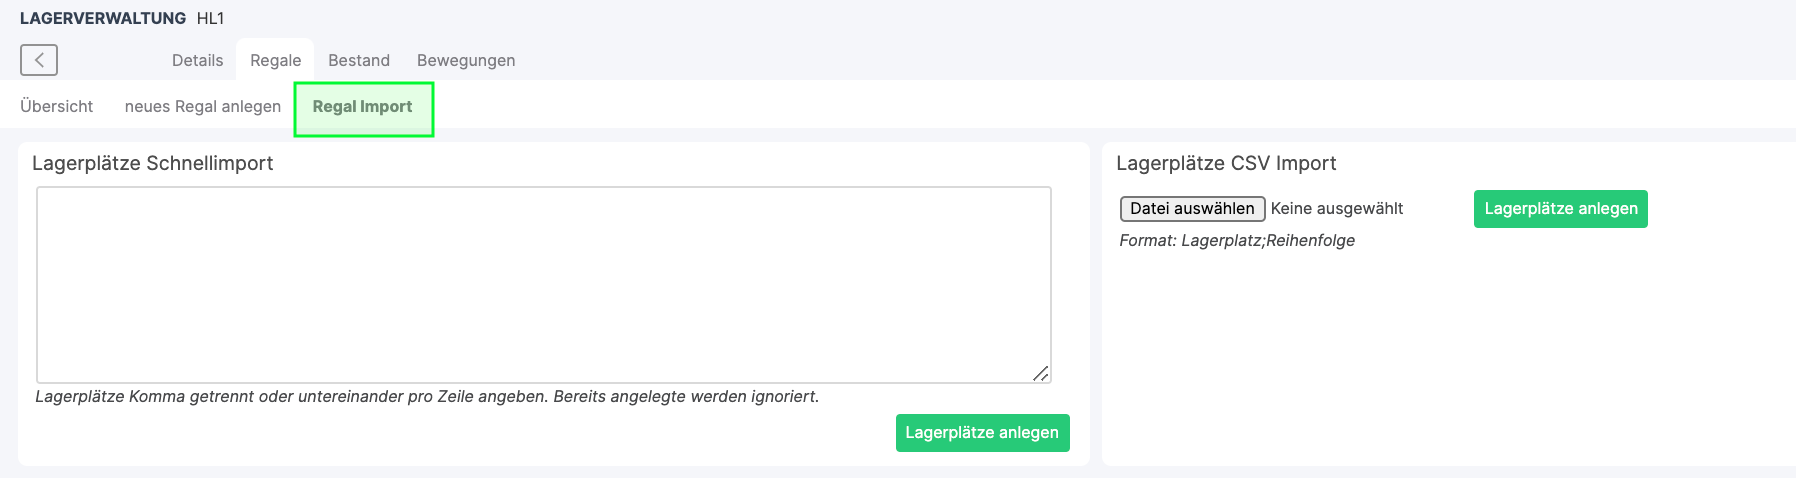 lagerverwaltung1.png